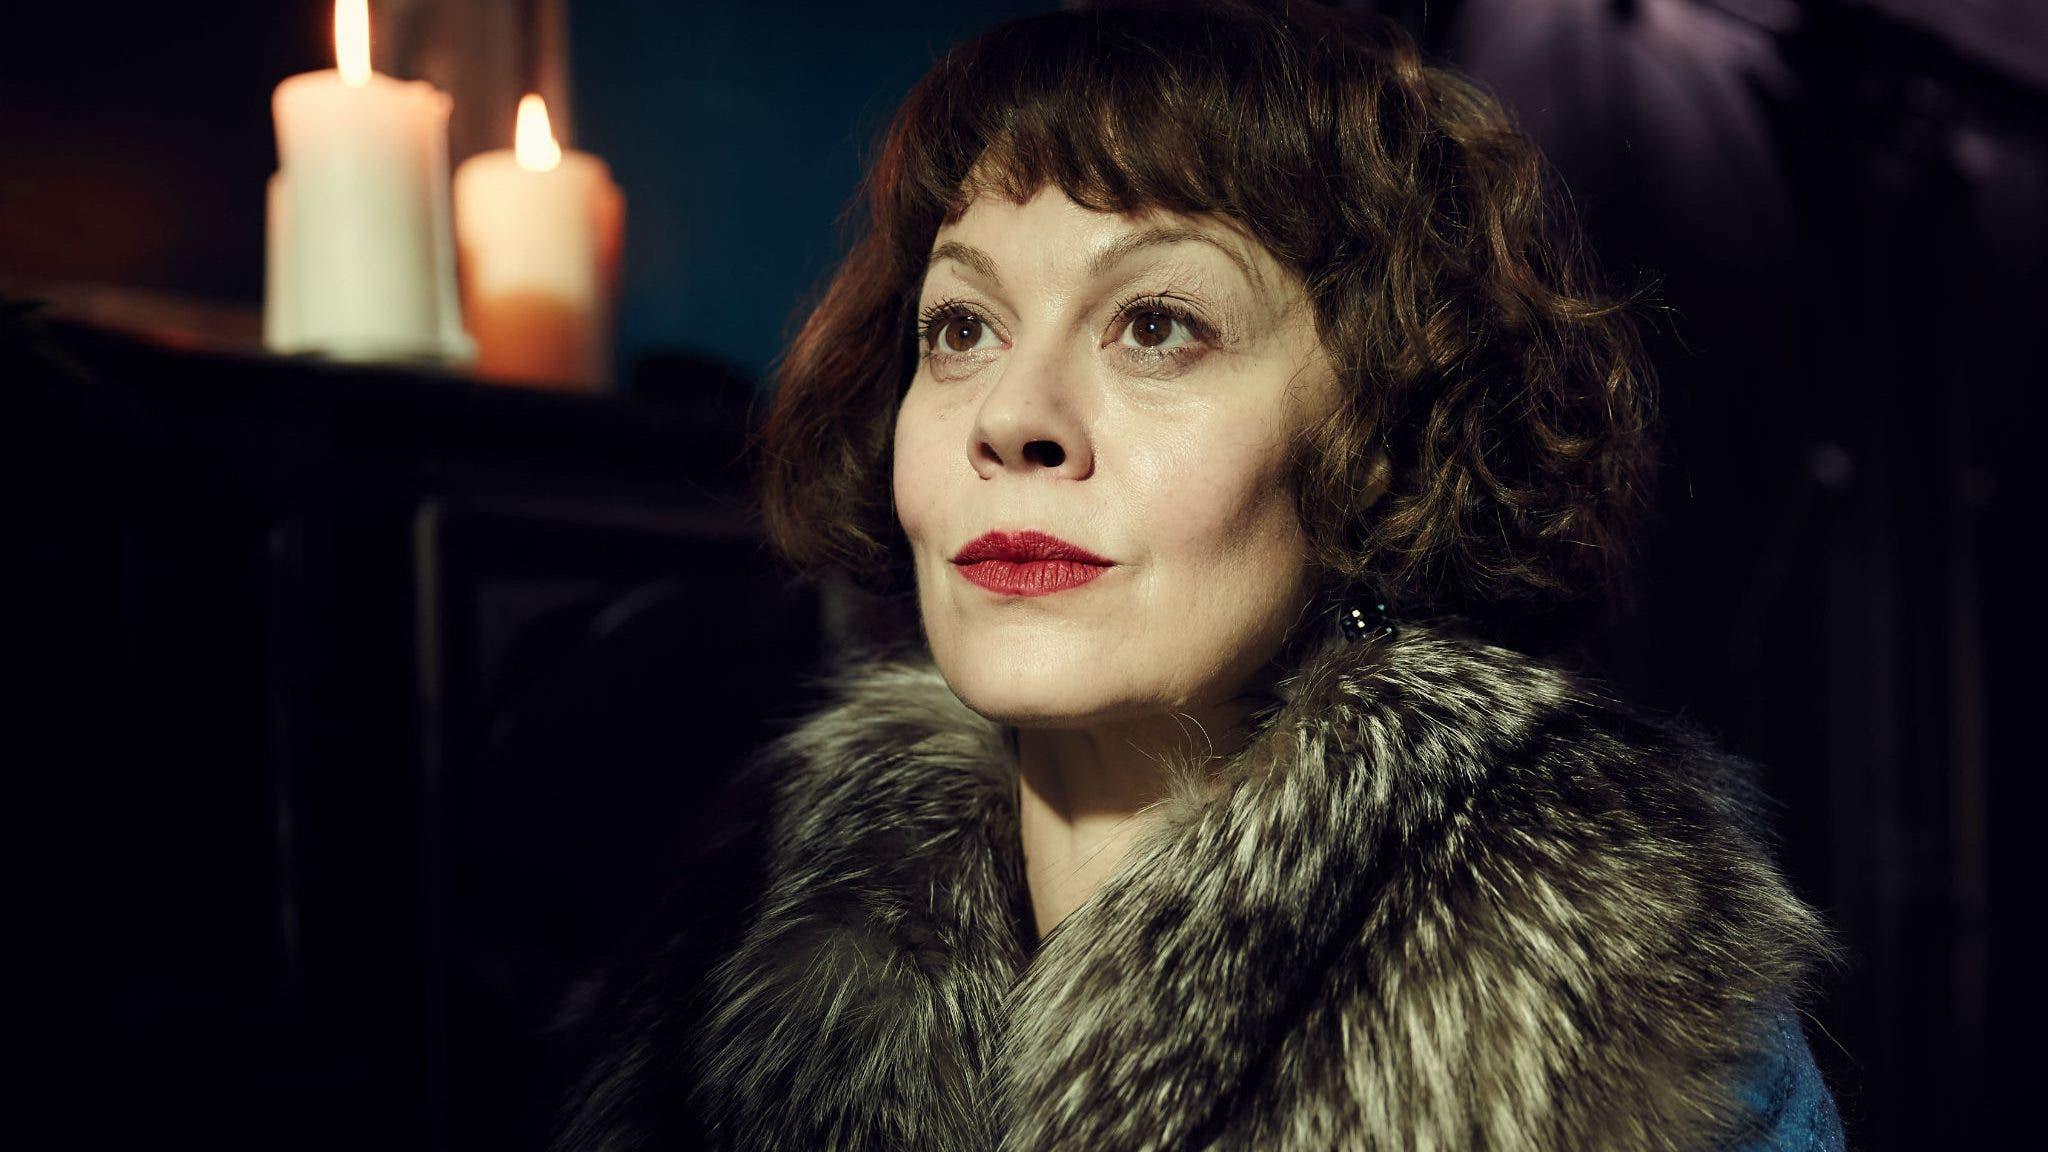 Helen McCroy, atriz de Peaky Blinders e Harry Potter, morre aos 52 anos